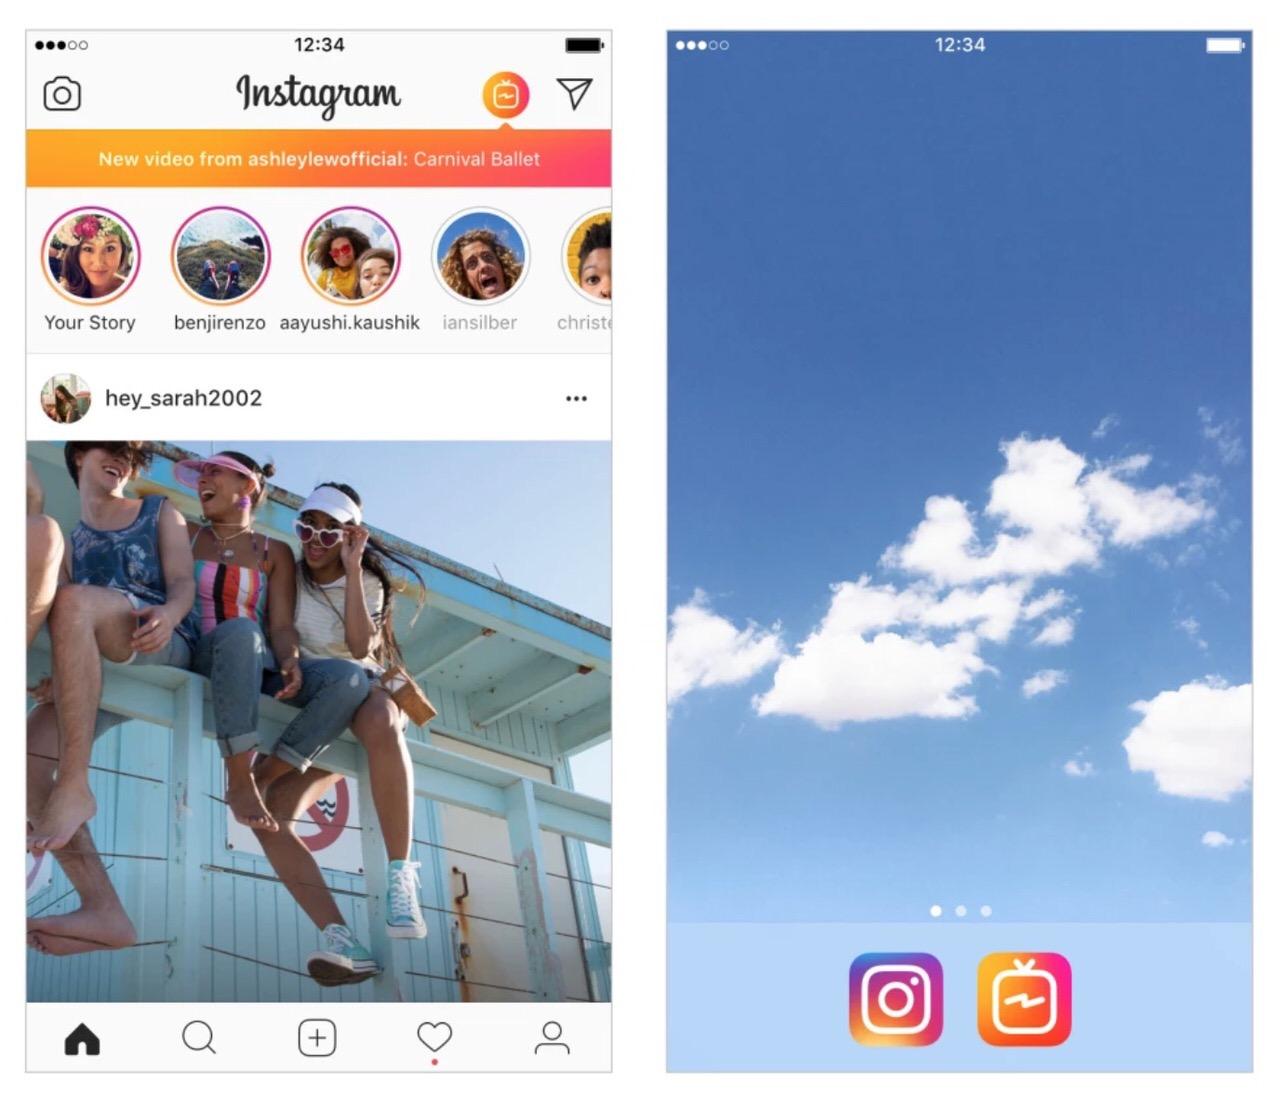 Instagramが縦方向の動画アプリ「IGTV」リリース 〜最長60分の投稿が可能